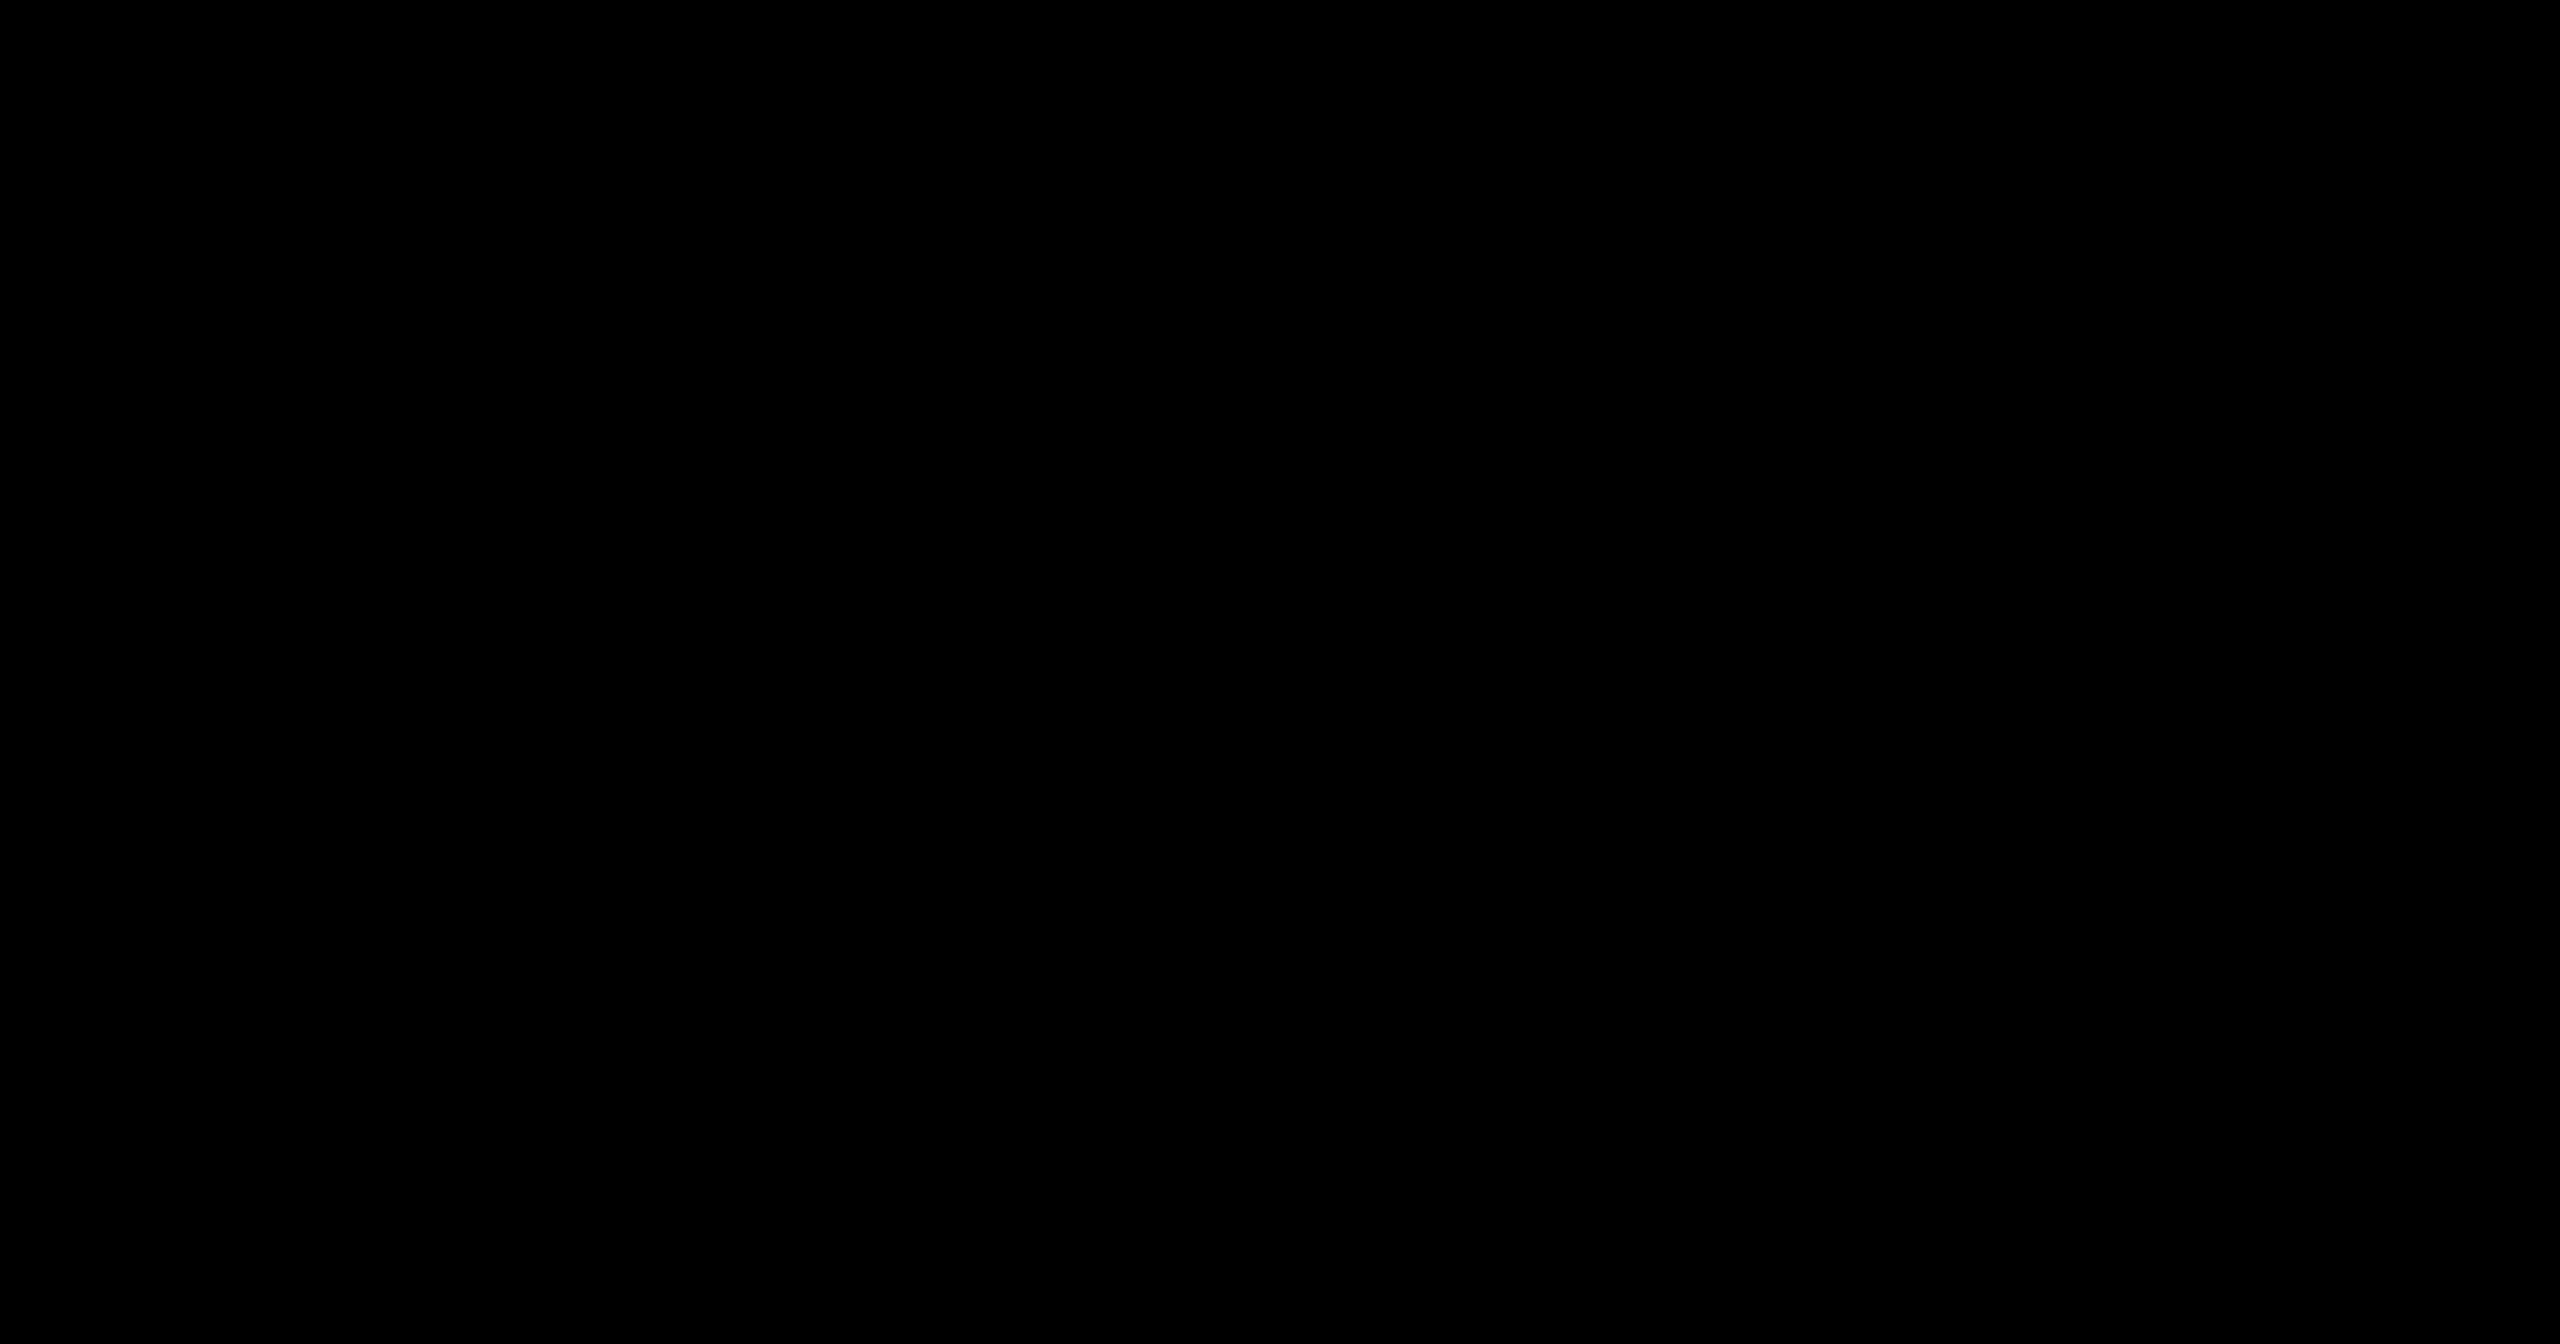 9 Spray Paint Arrow (PNG Transparent) | OnlyGFX com